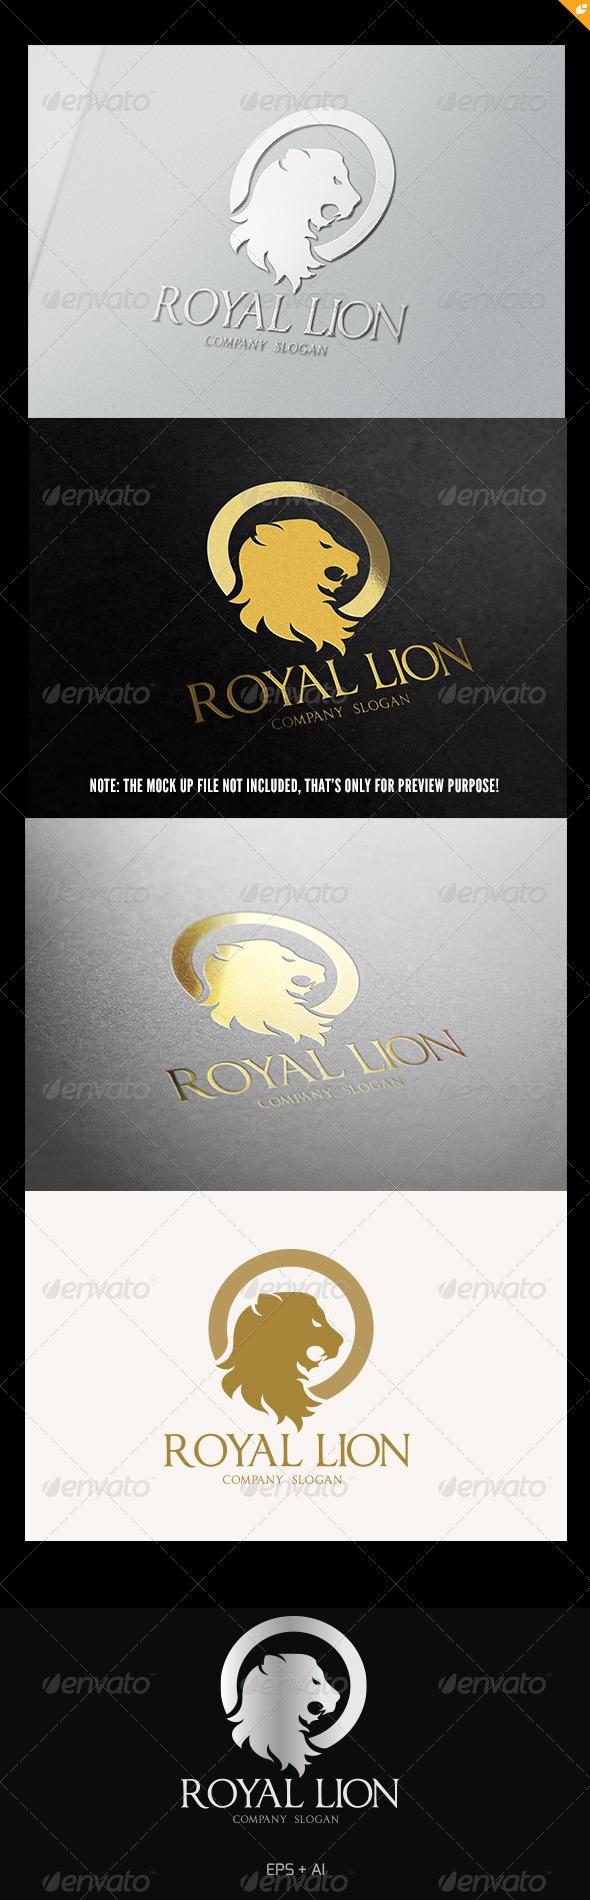 GraphicRiver Royal Lion Logo 5409327